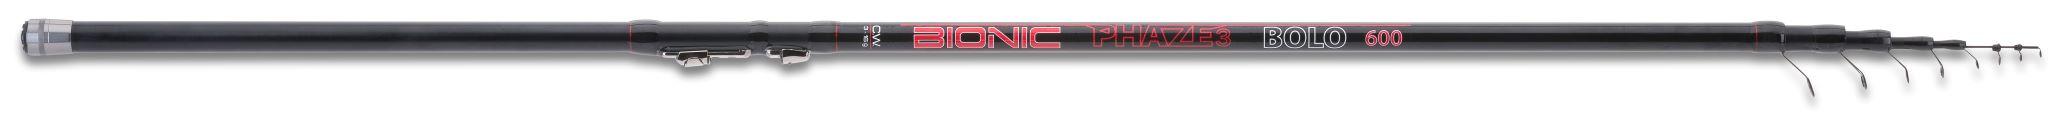 Rybářský prut Saenger Bionic Phaze 3 Completiton Bolo Varianta 5.00m